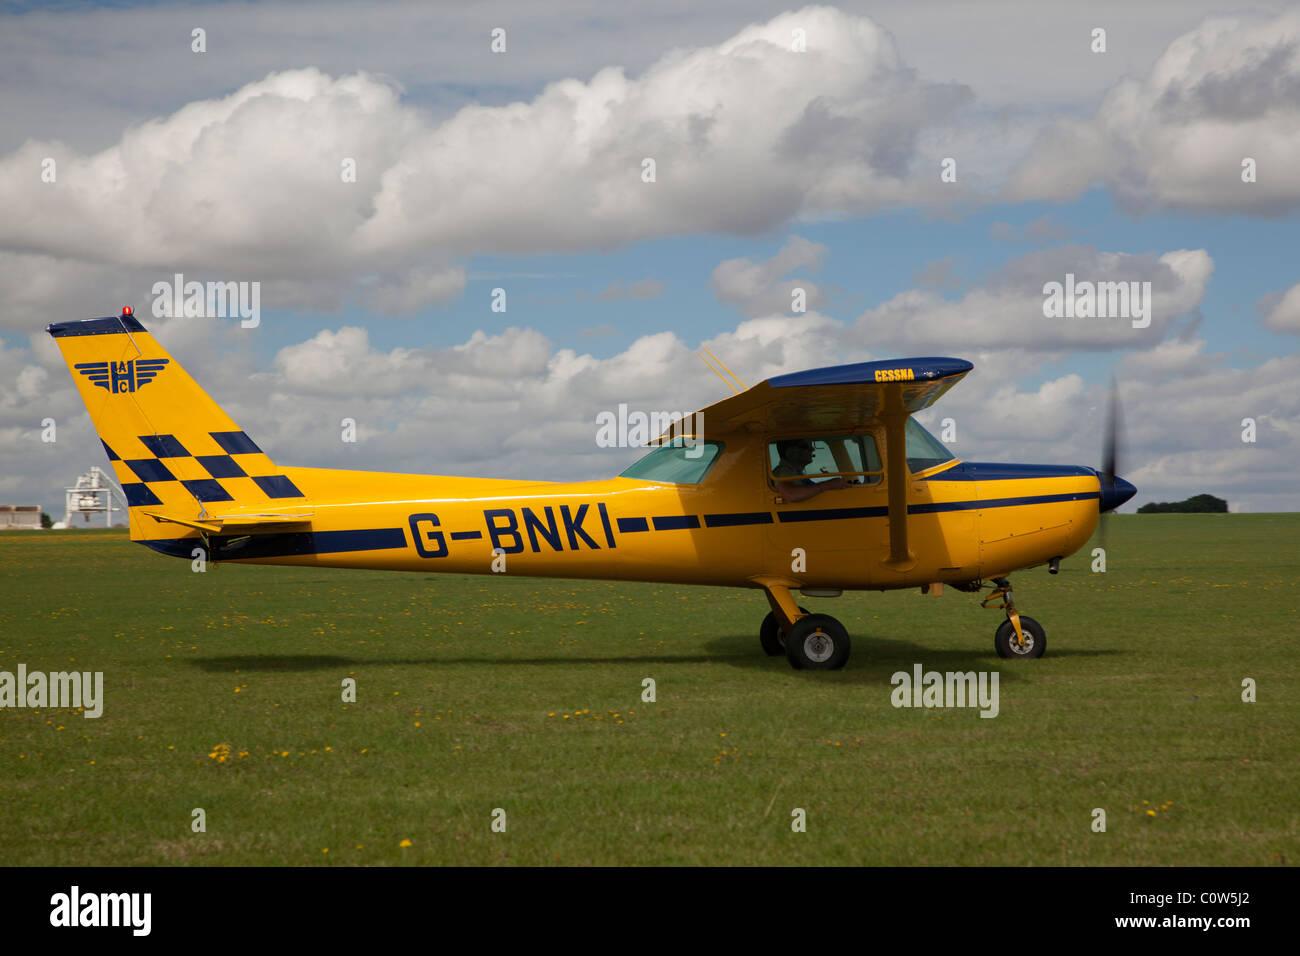 Cessna 152 reg G-BNKI, at Sywell - Stock Image